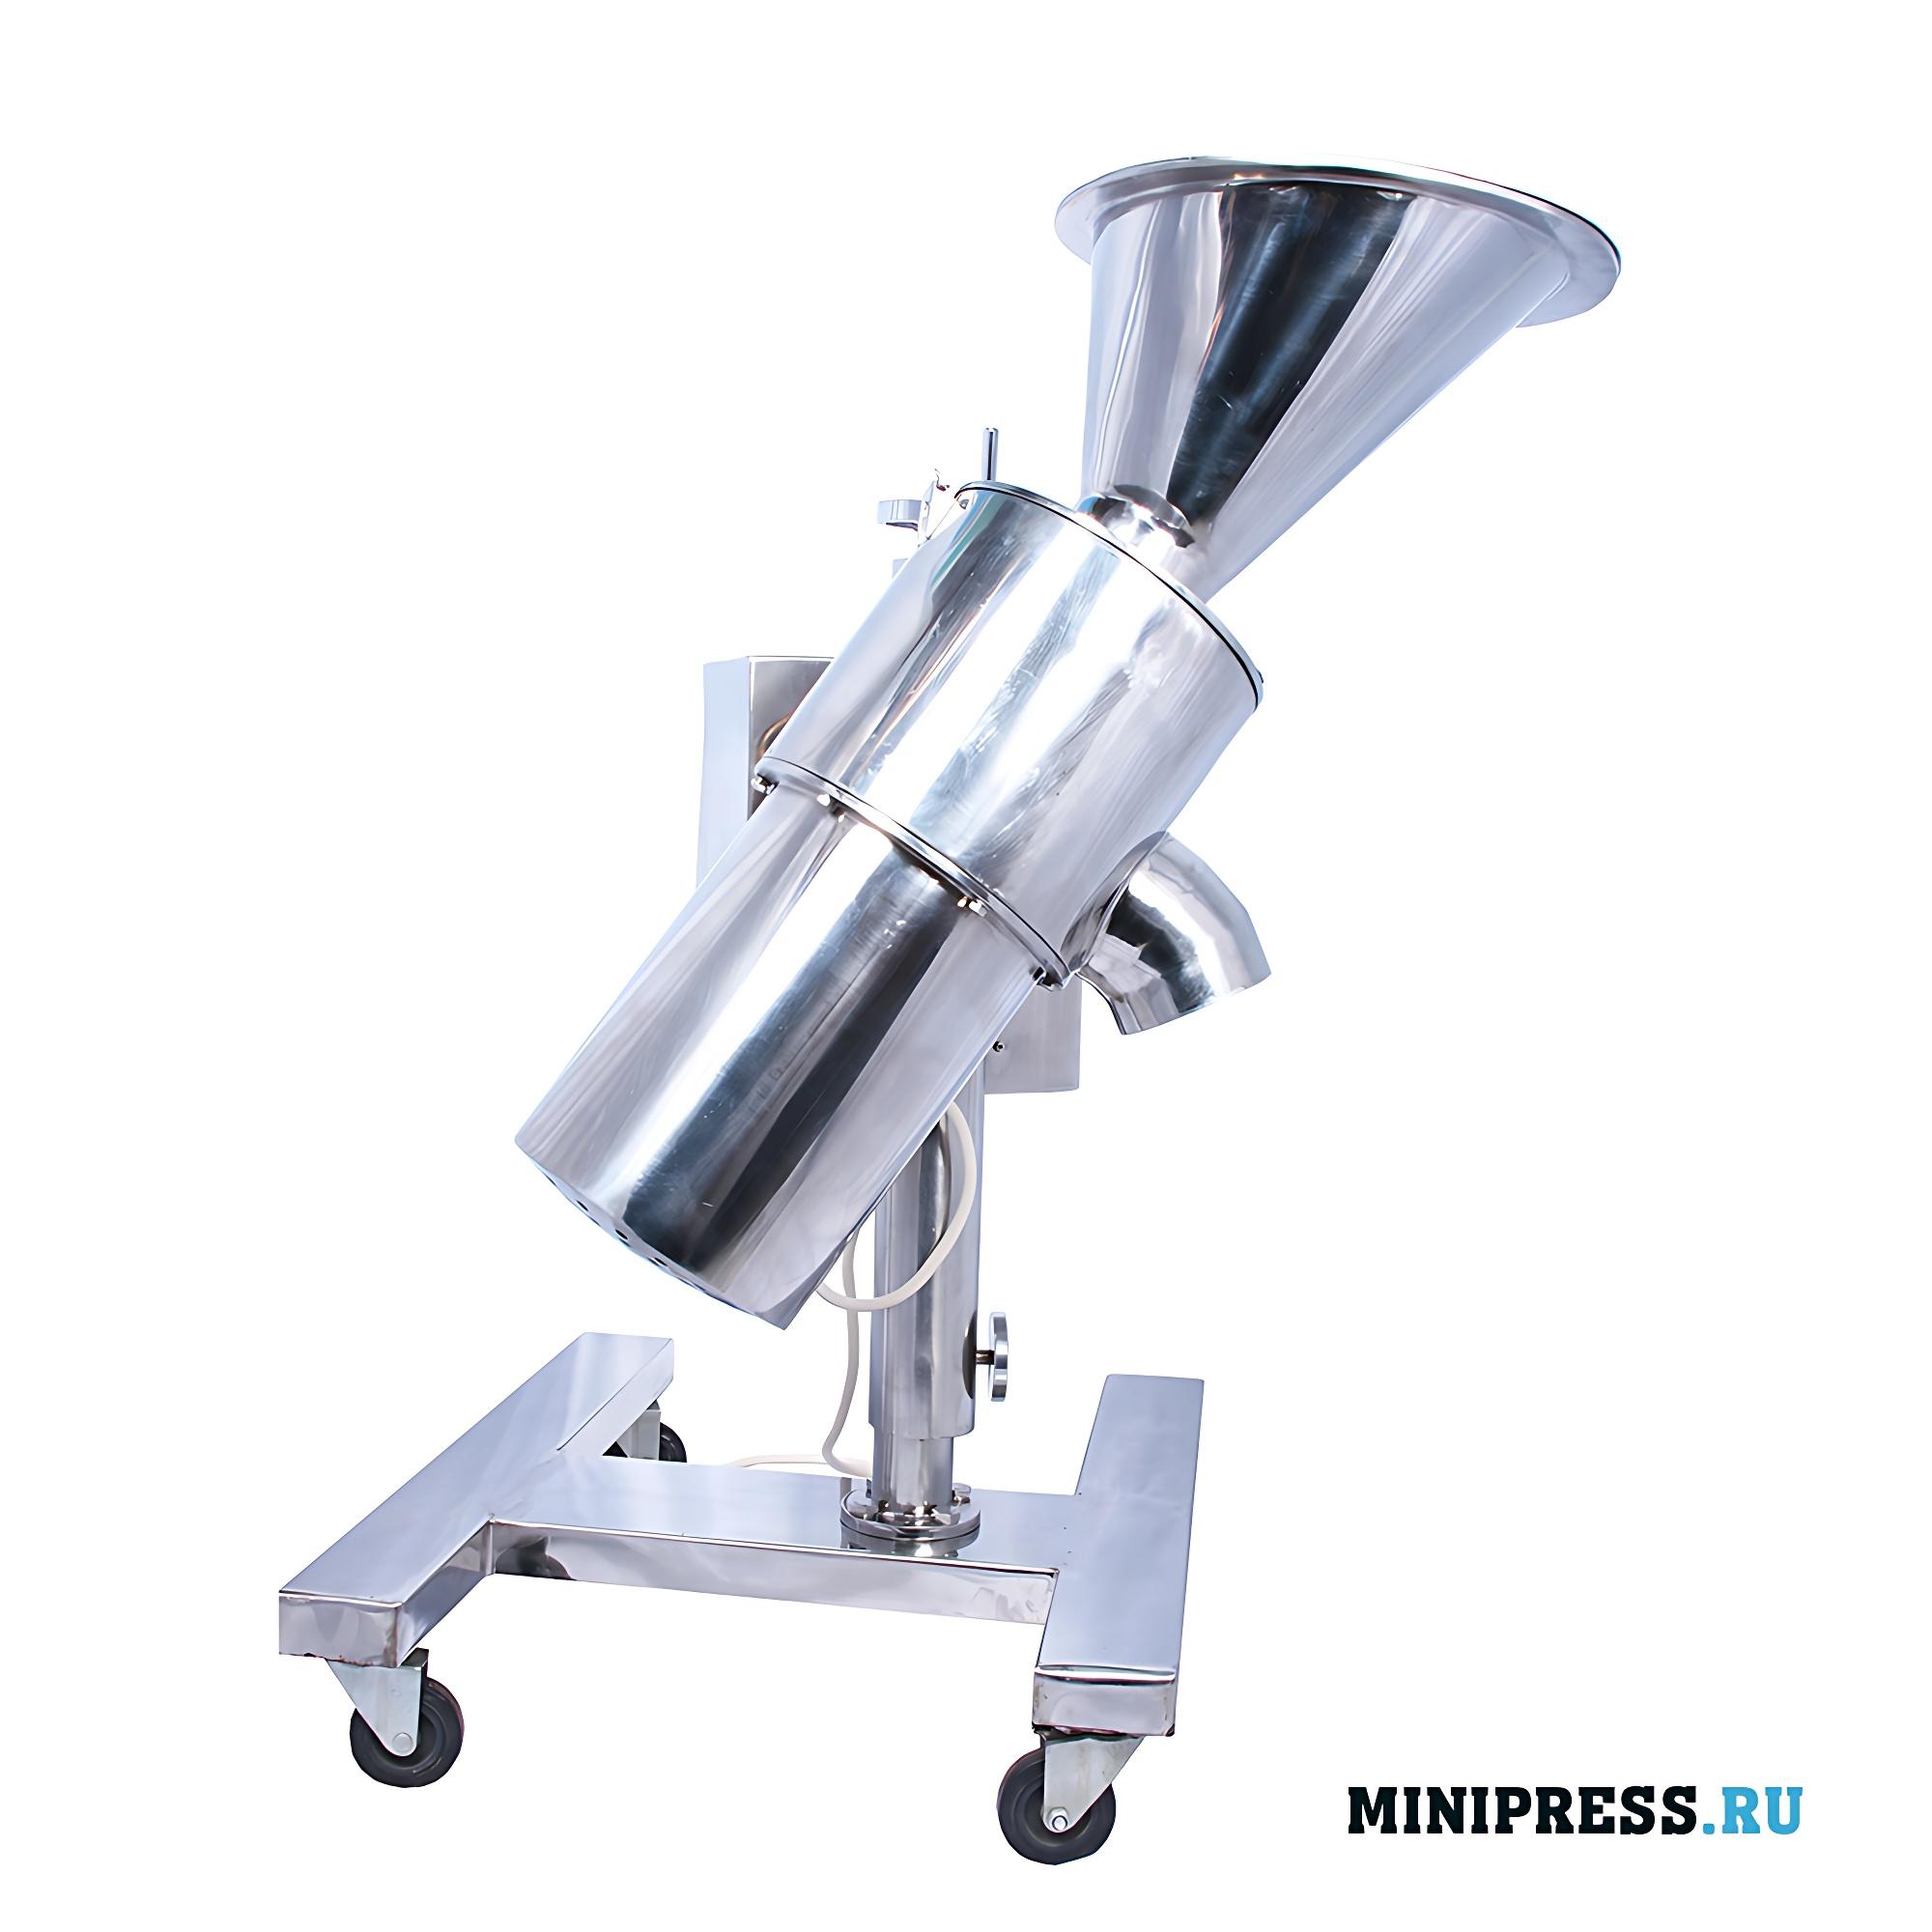 Автоматический гранулятор центробежного типа гранулирования порошков